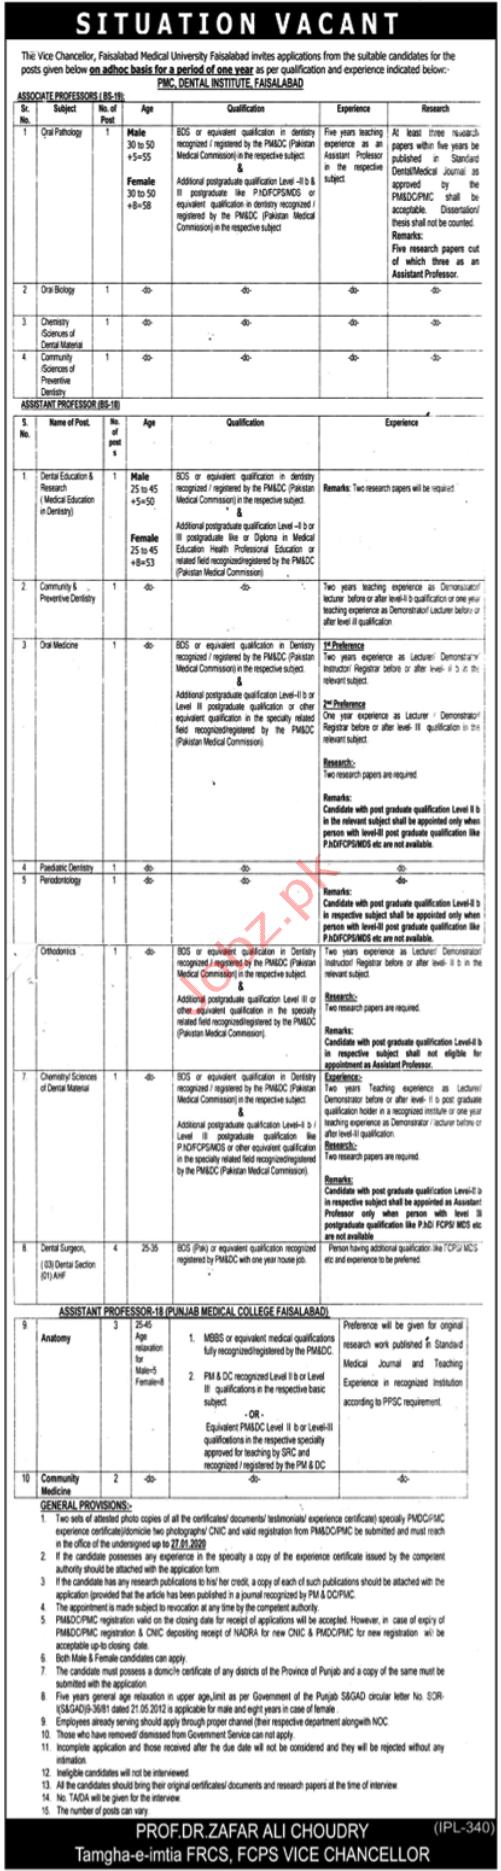 Faisalabad Medical University Jobs 2020